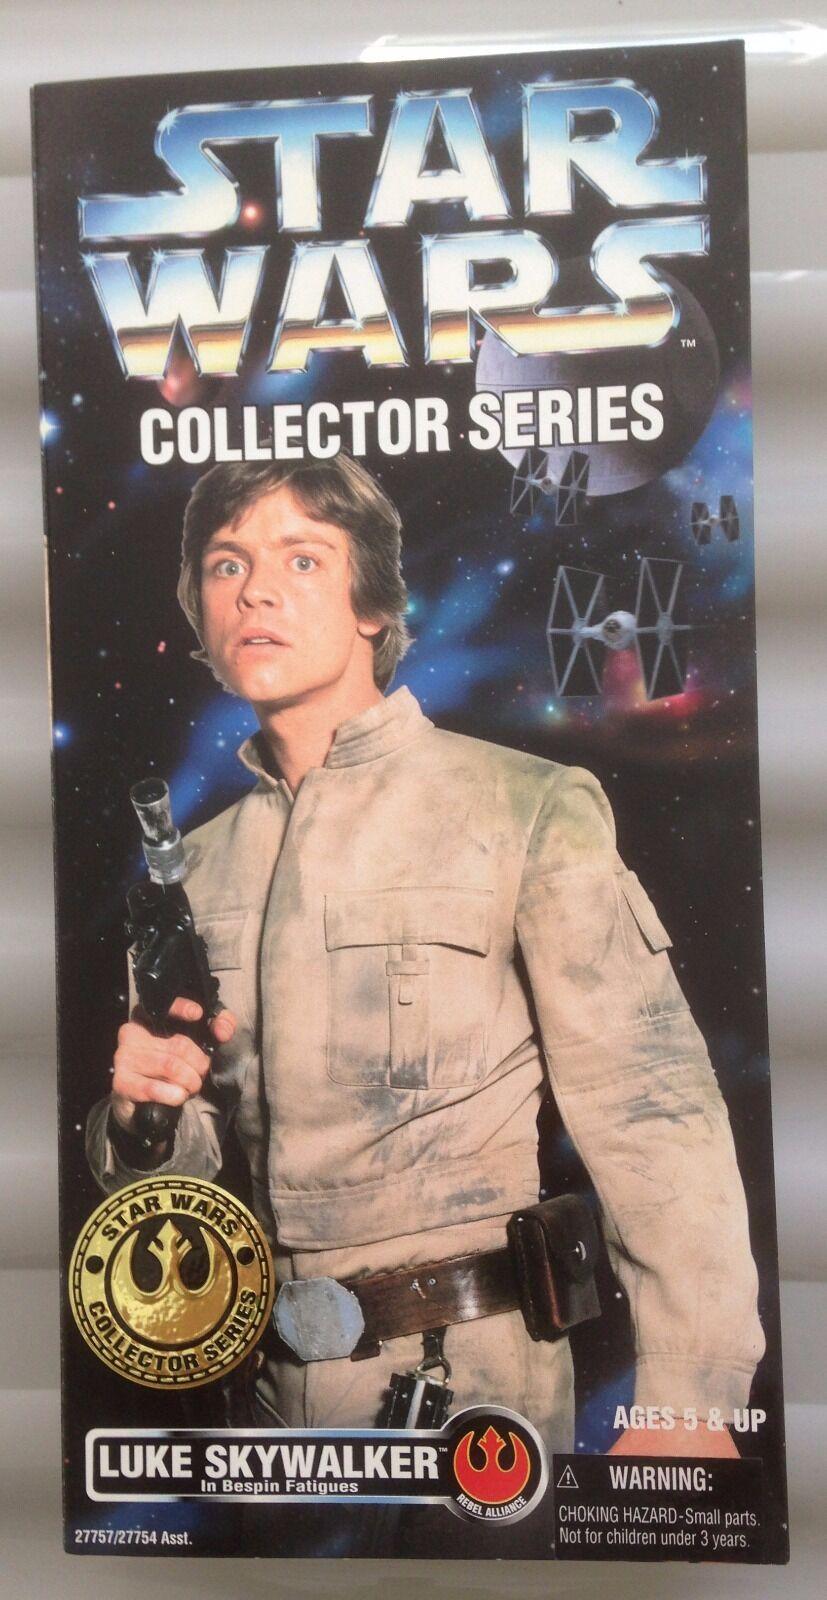 Star Wars Collectors Series Luke Skywalker in Bespin Fatigues 12''